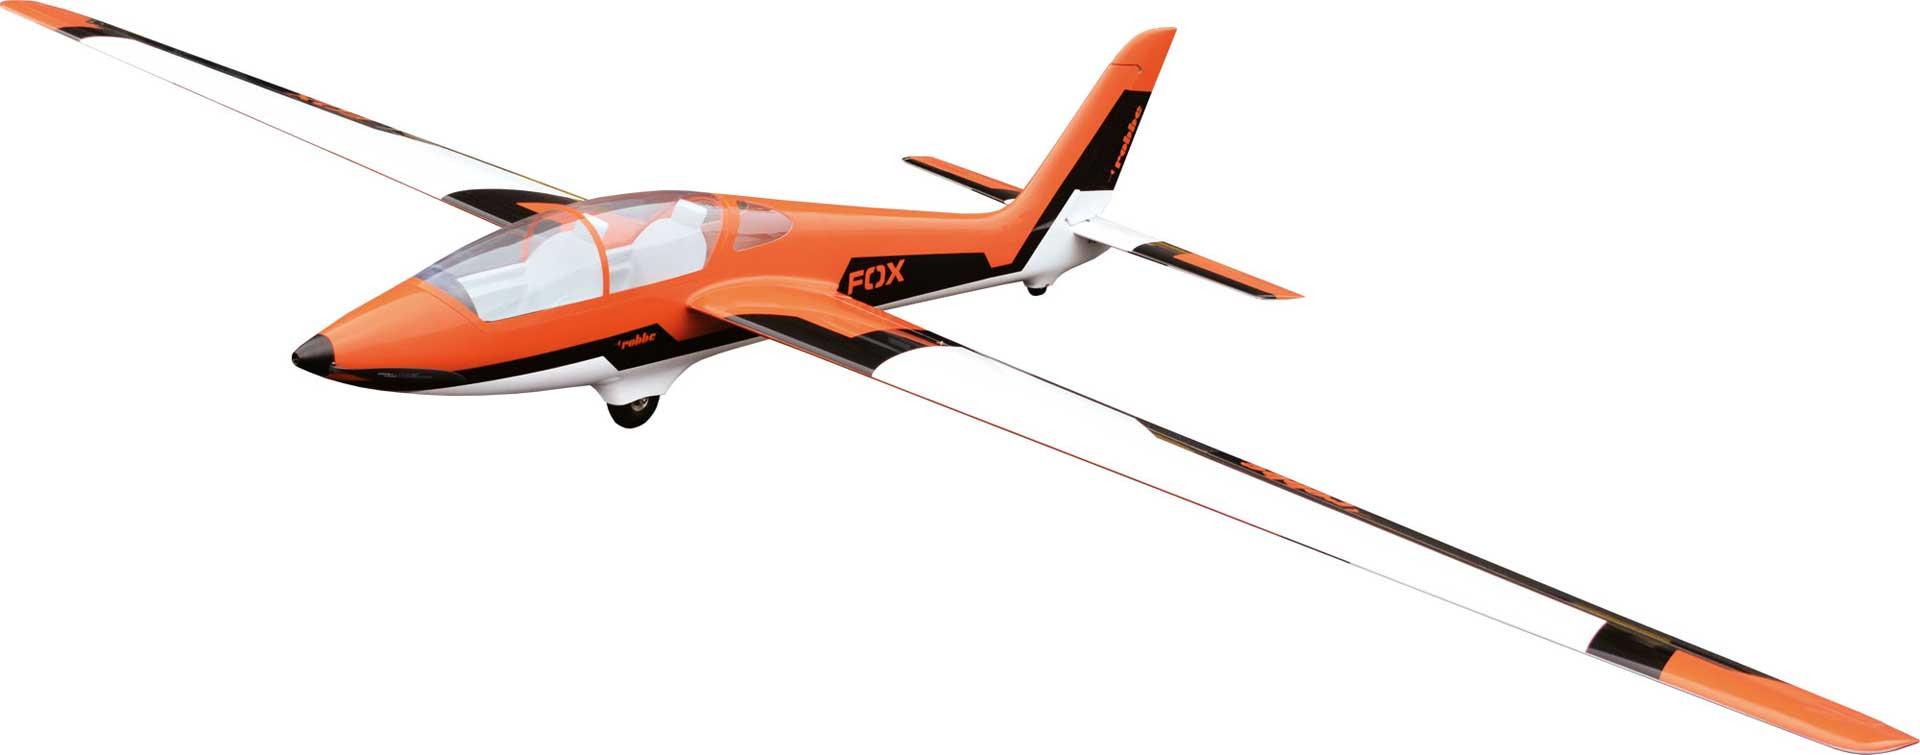 Robbe Modellsport MDM-1 FOX 3,5m Elektro PNP Voll GFK/CFK lackiert Orange Kunstflug Segelflugzeug